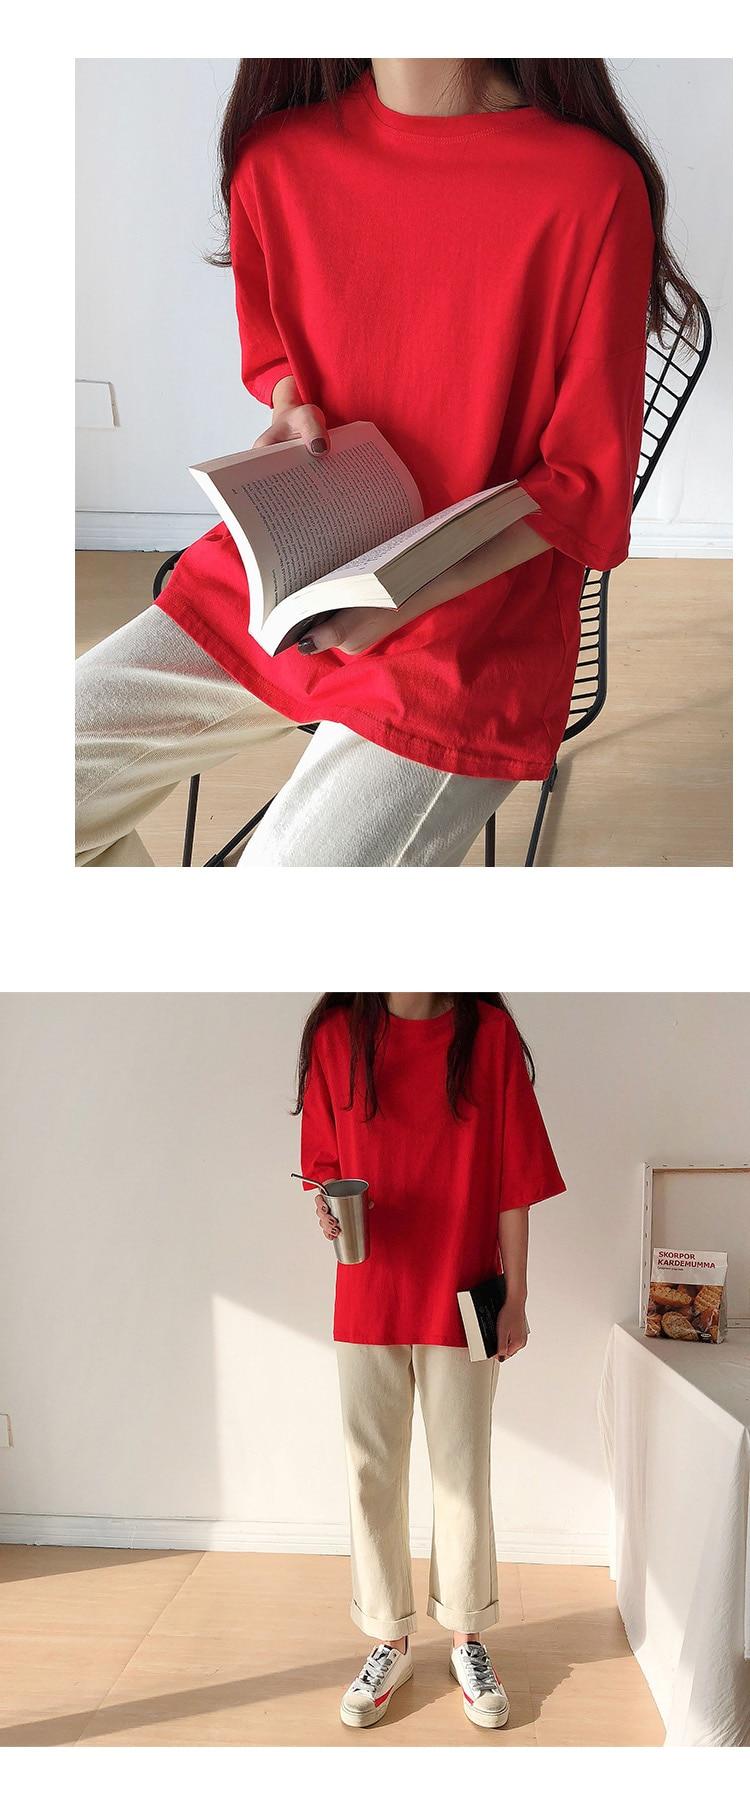 Ha78aeadfc77e4d22b69f5dd9648f945fT - Summer O-Neck Short Sleeves Minimalist Loose Basic T-Shirt